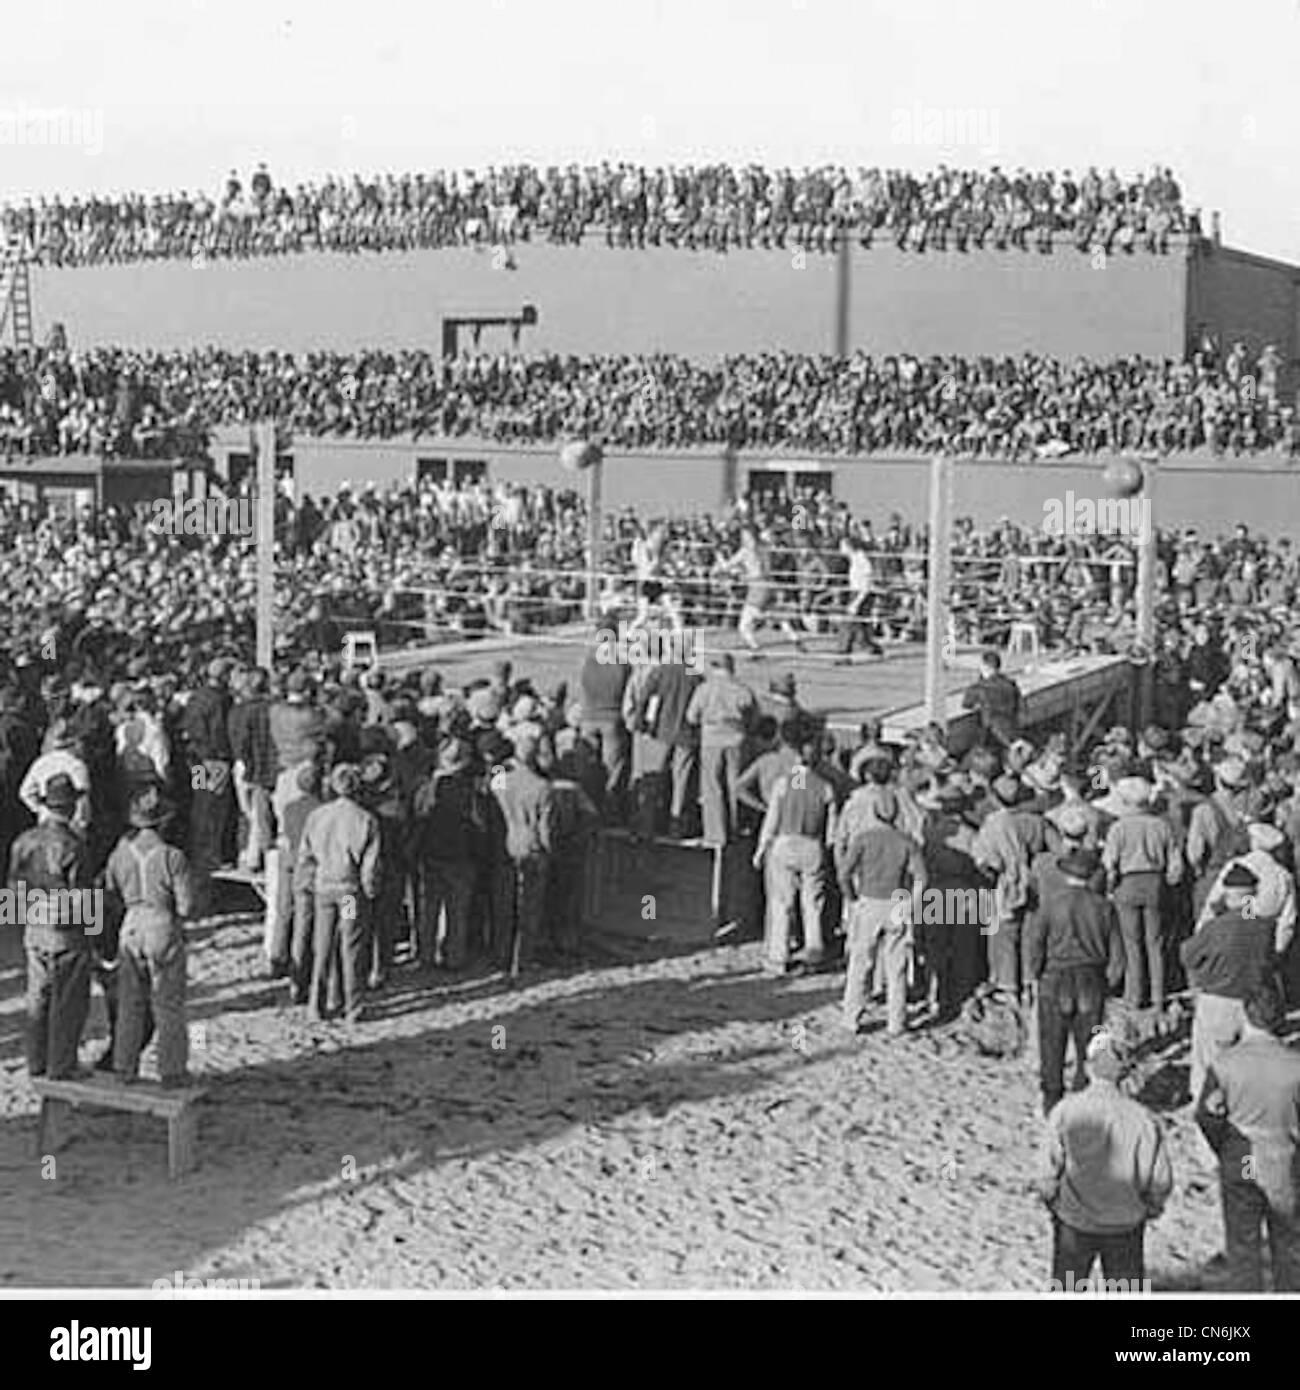 Boxing match outside of mess hall, Allied forces base, Adak Island, July 4, 1944. - Stock Image